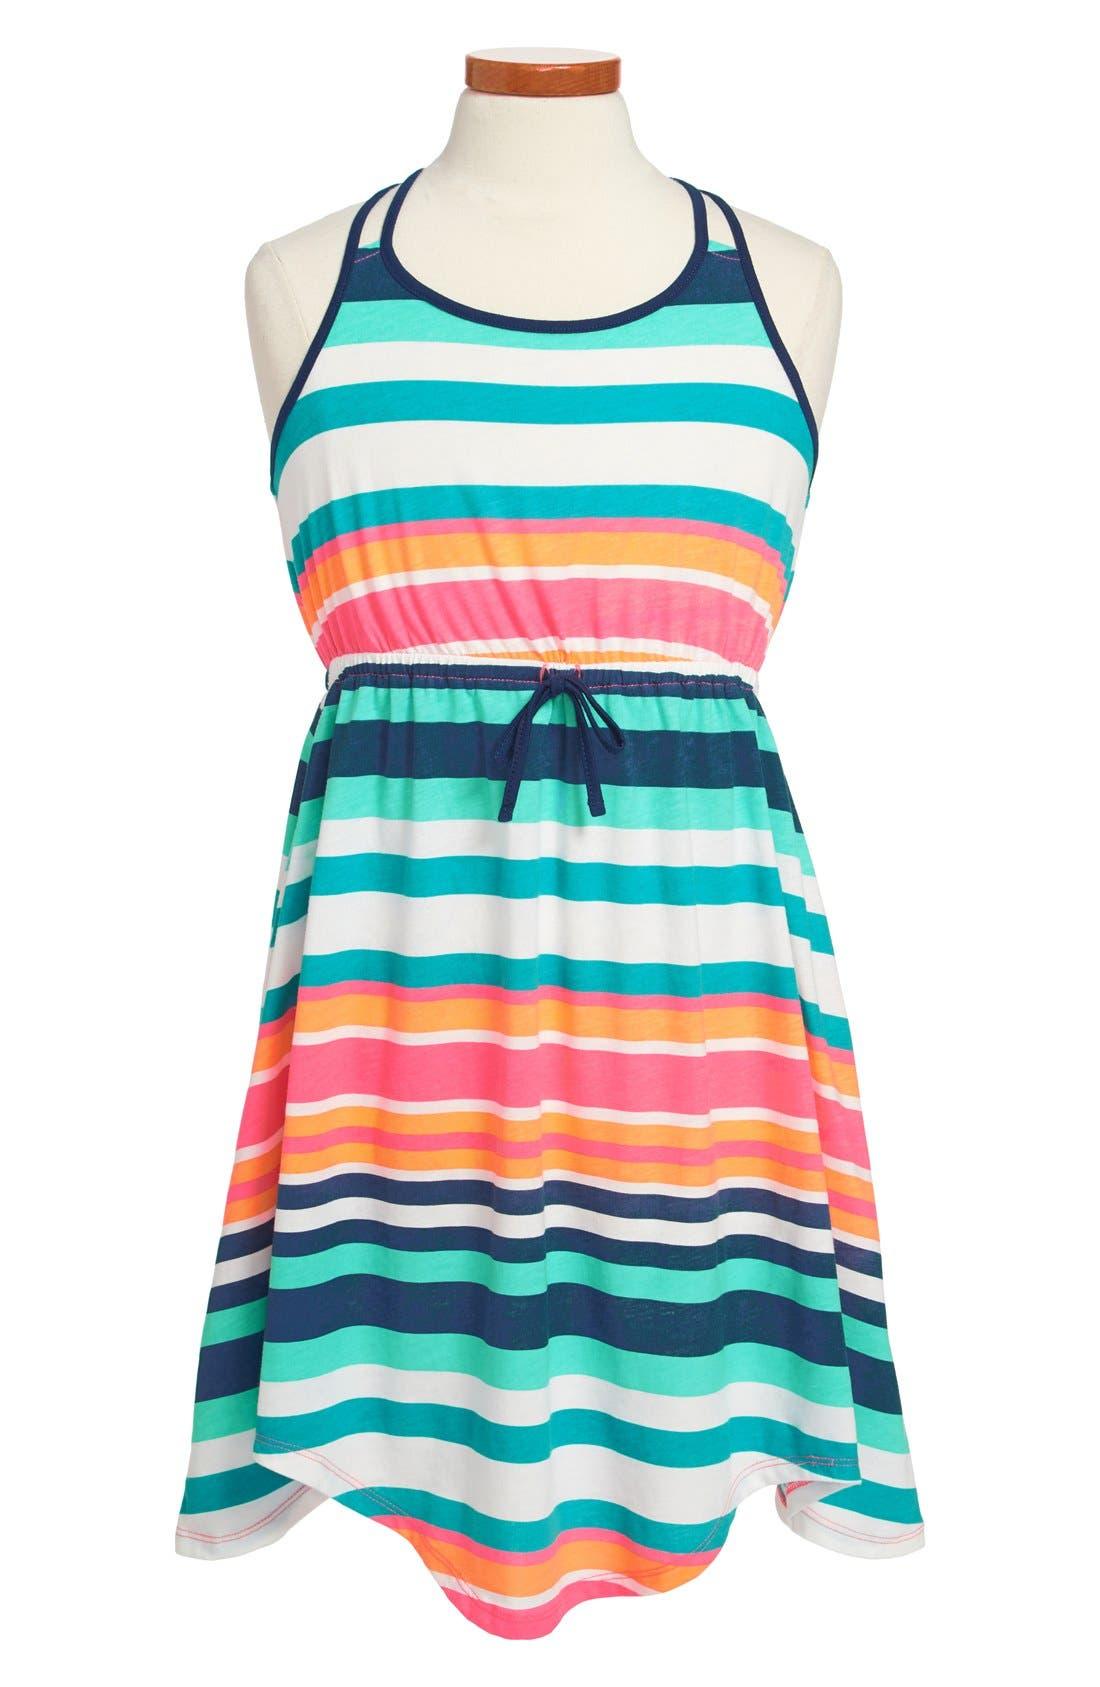 Main Image - Roxy 'Just Begun' Stripe Dress (Big Girls)